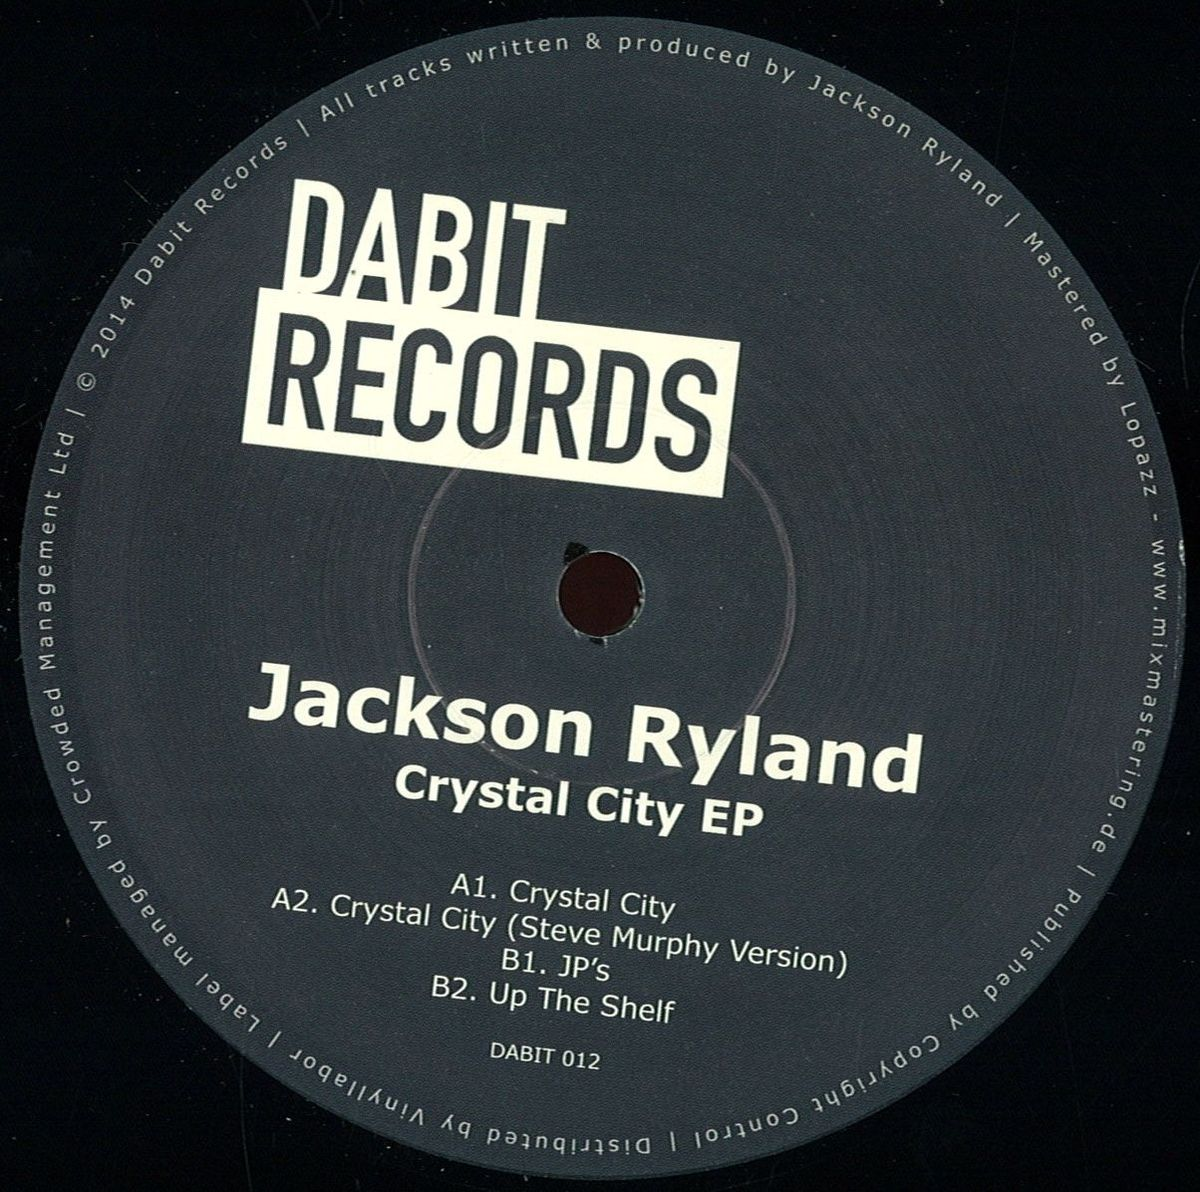 Jackson Ryland – Crystal City EP (Dabit Rec. 012)